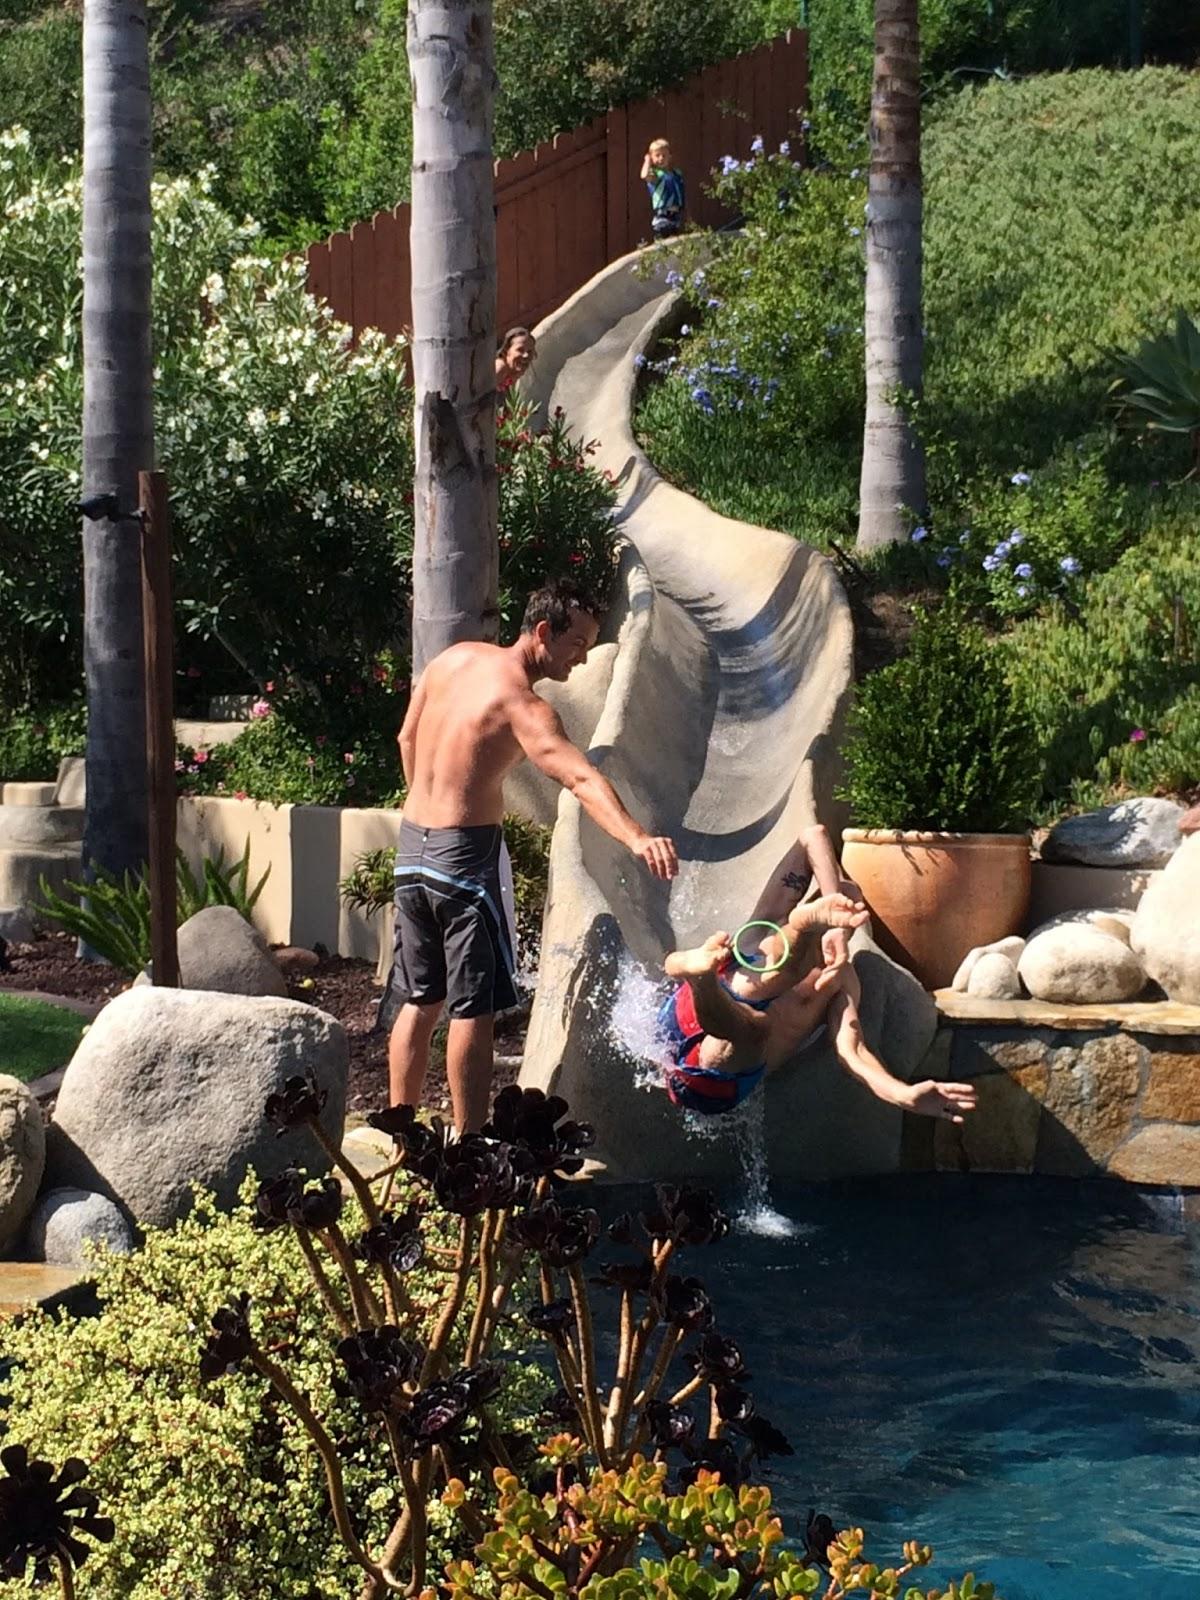 Pool slide hook up